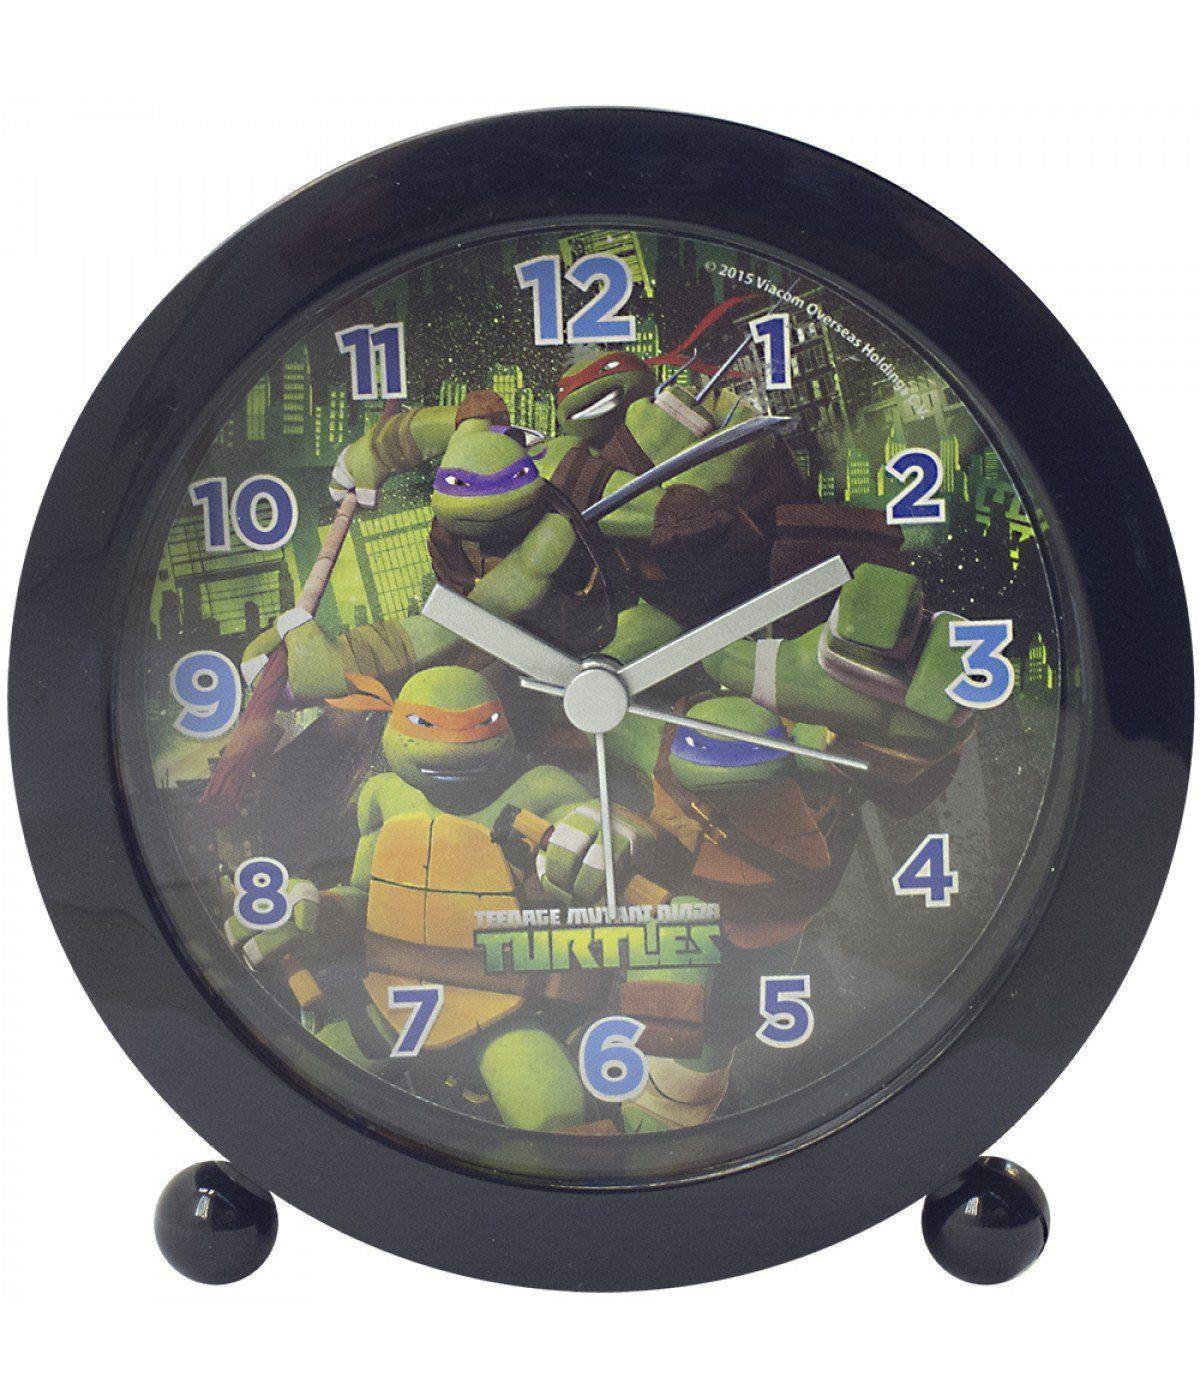 Relógio Despertador Tartarugas Ninja: Tartarugas Ninja